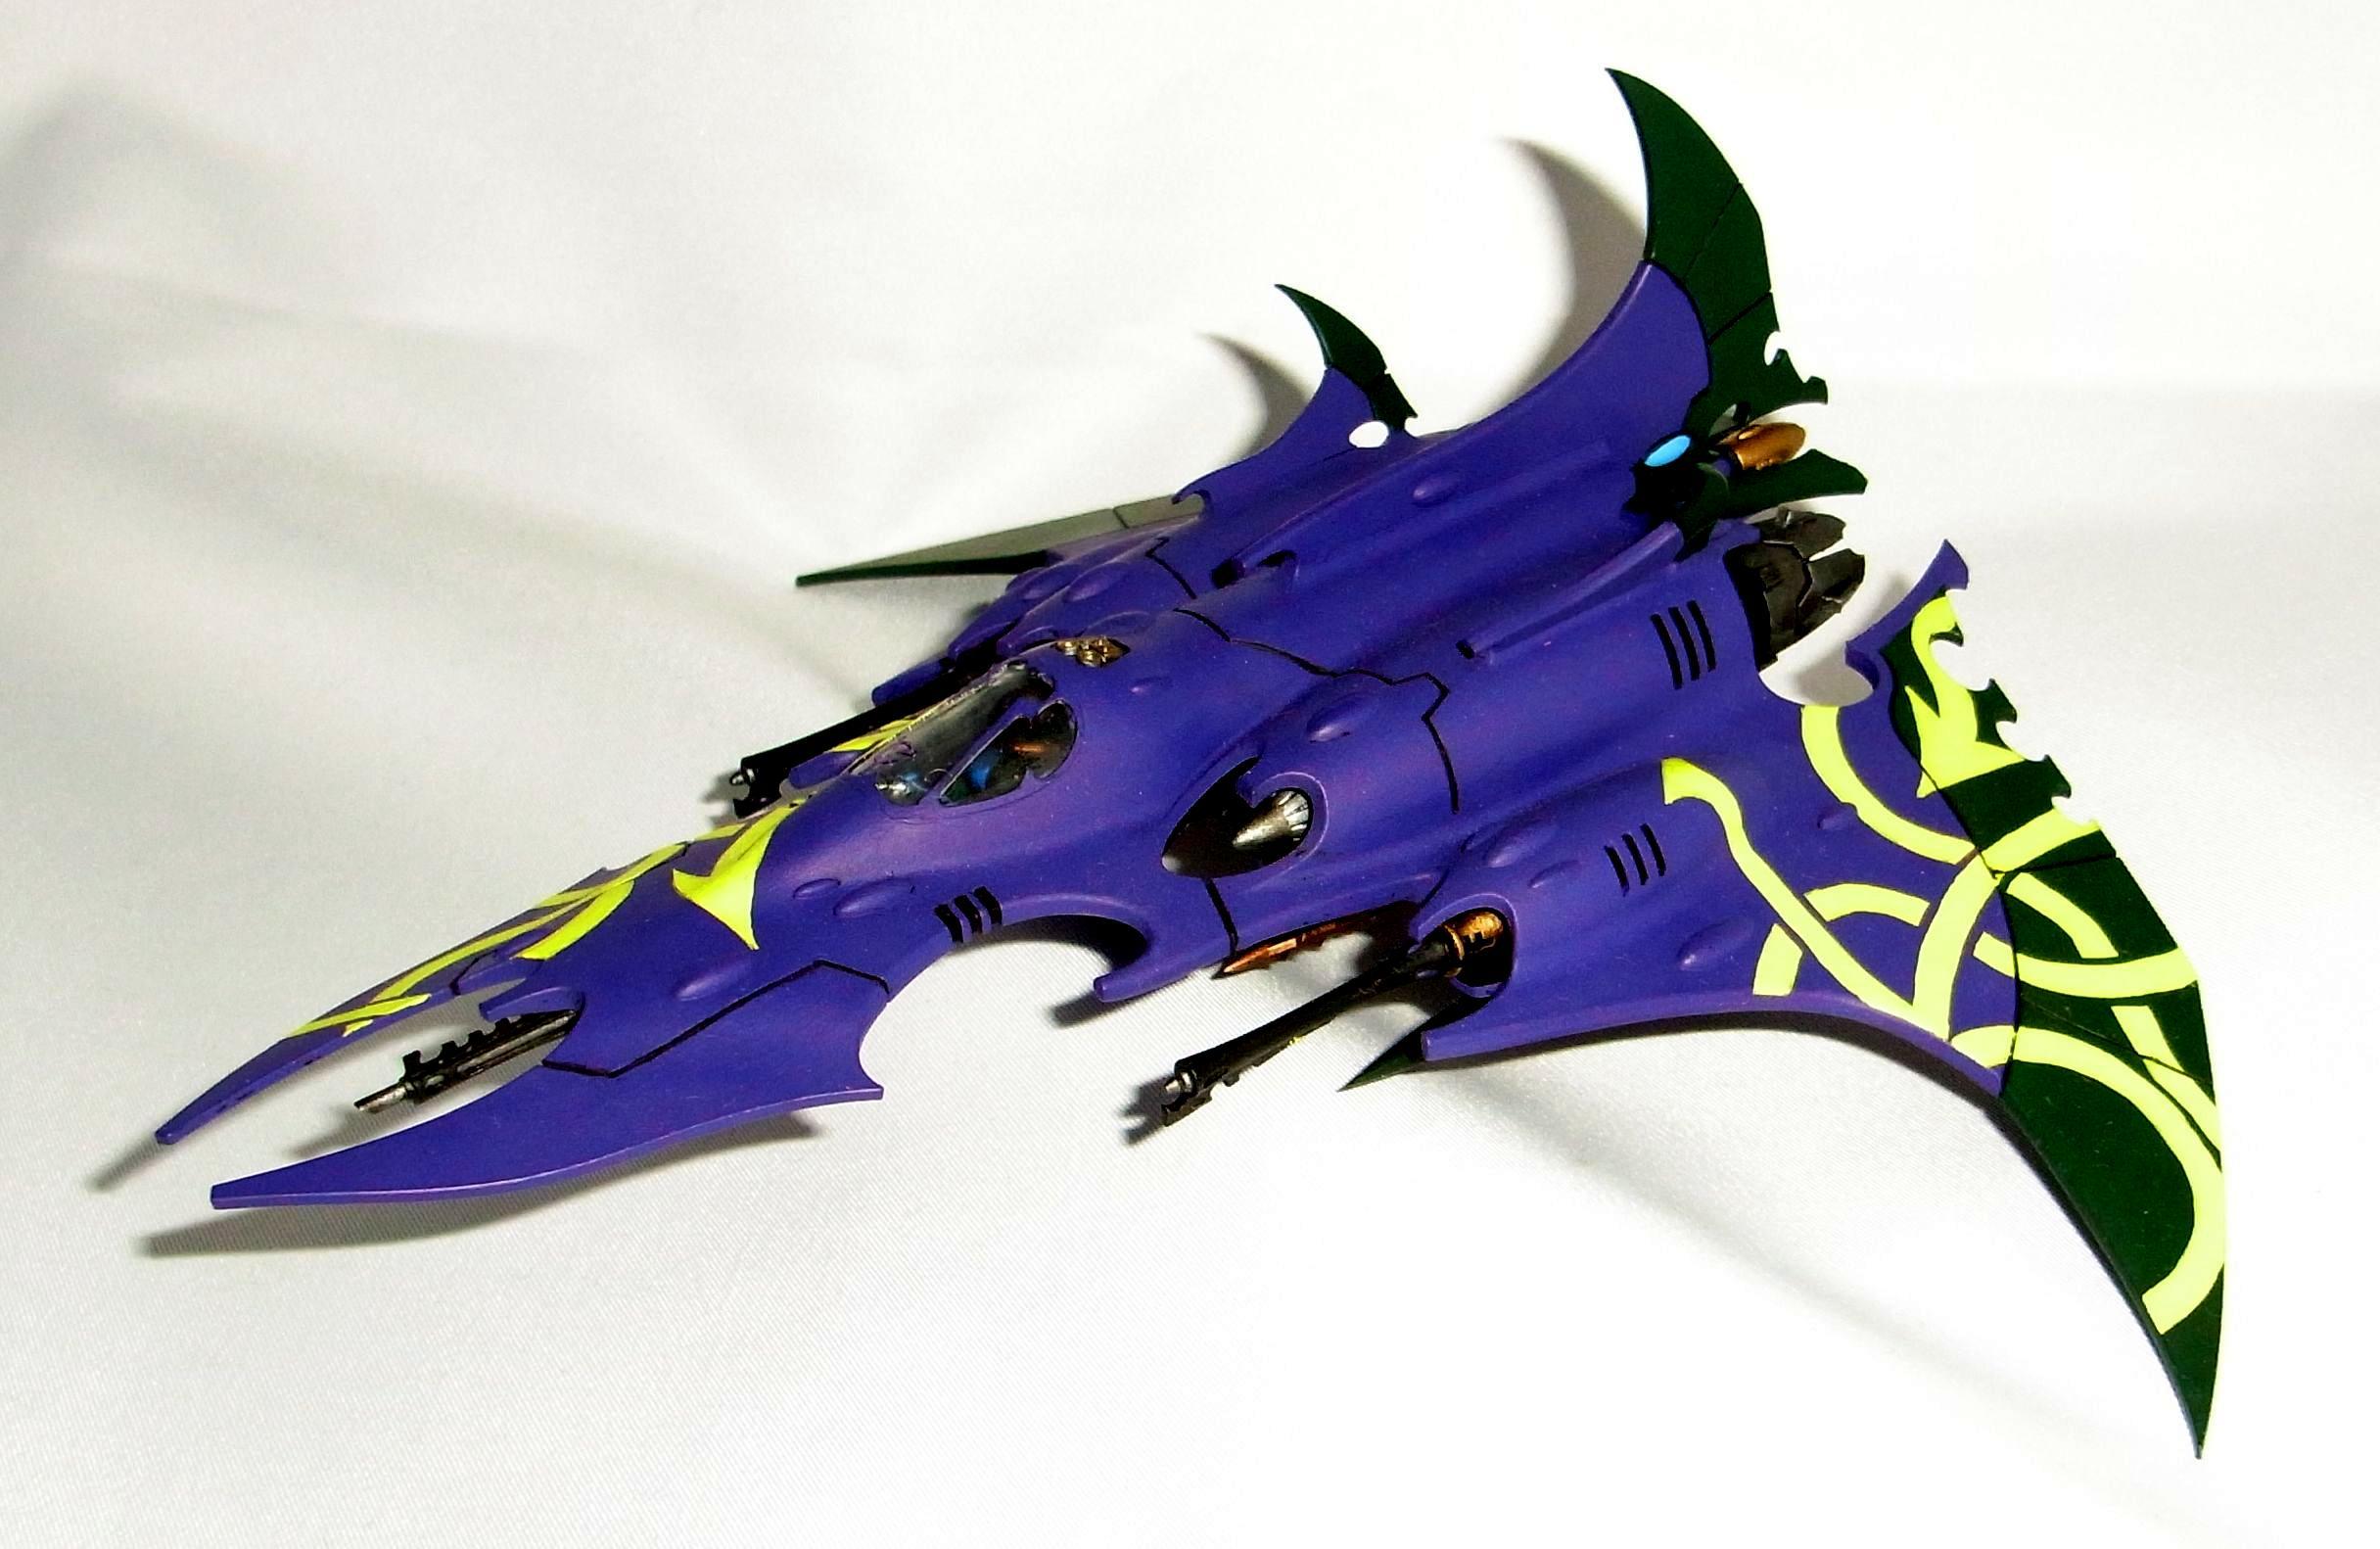 Aircraft, Dark, Eldar, Fighter, Korbenn, Plane, Purple, Razorwing